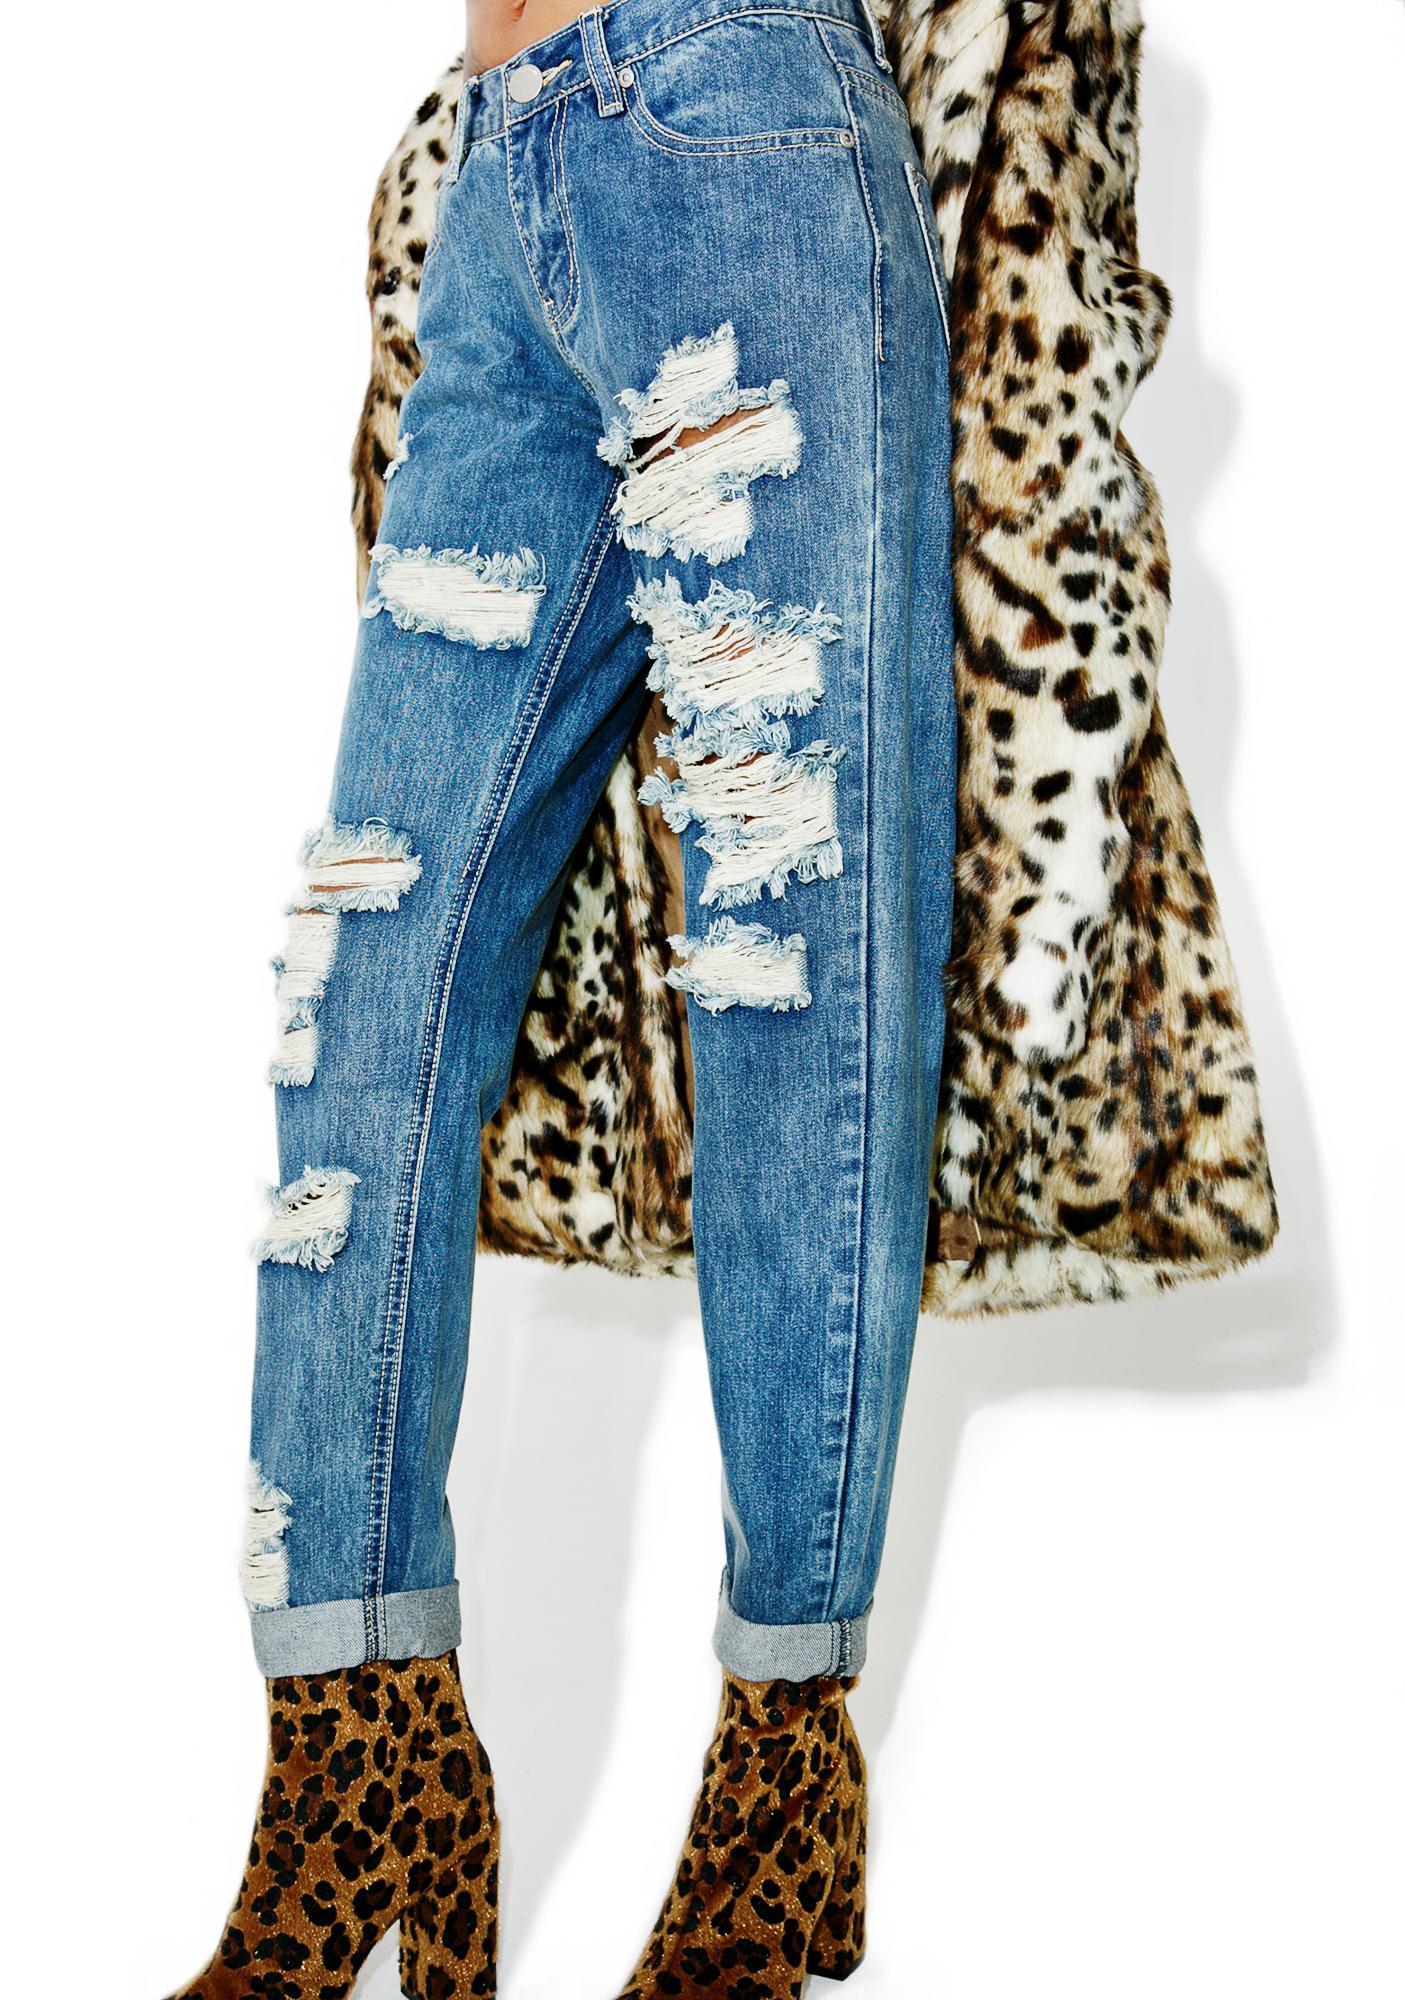 Glamorous Metropolis Distressed Jeans